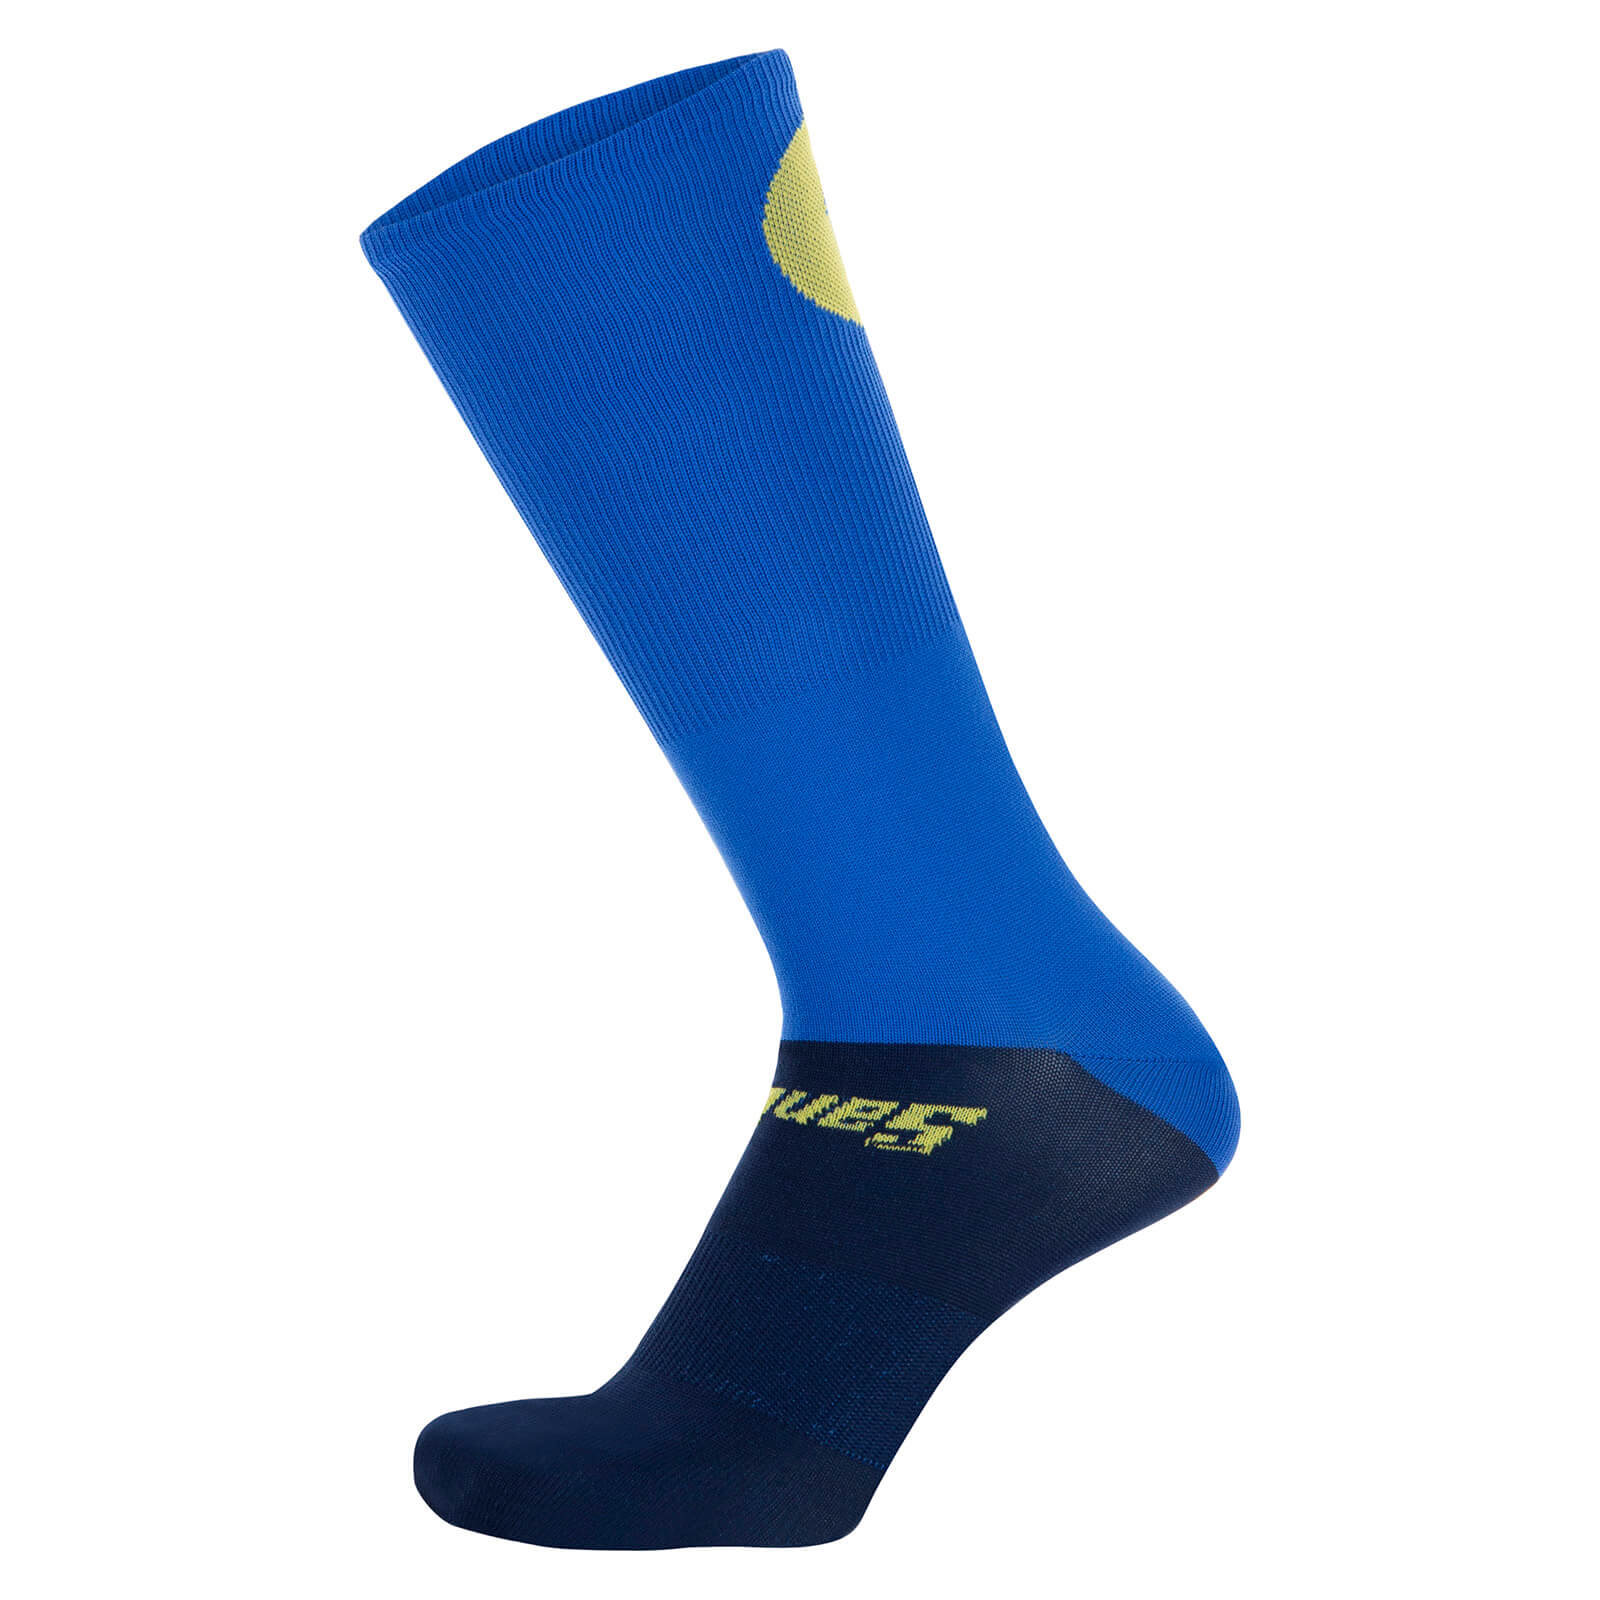 Santini La Vuelta 2021 Galicia Socks - M-L